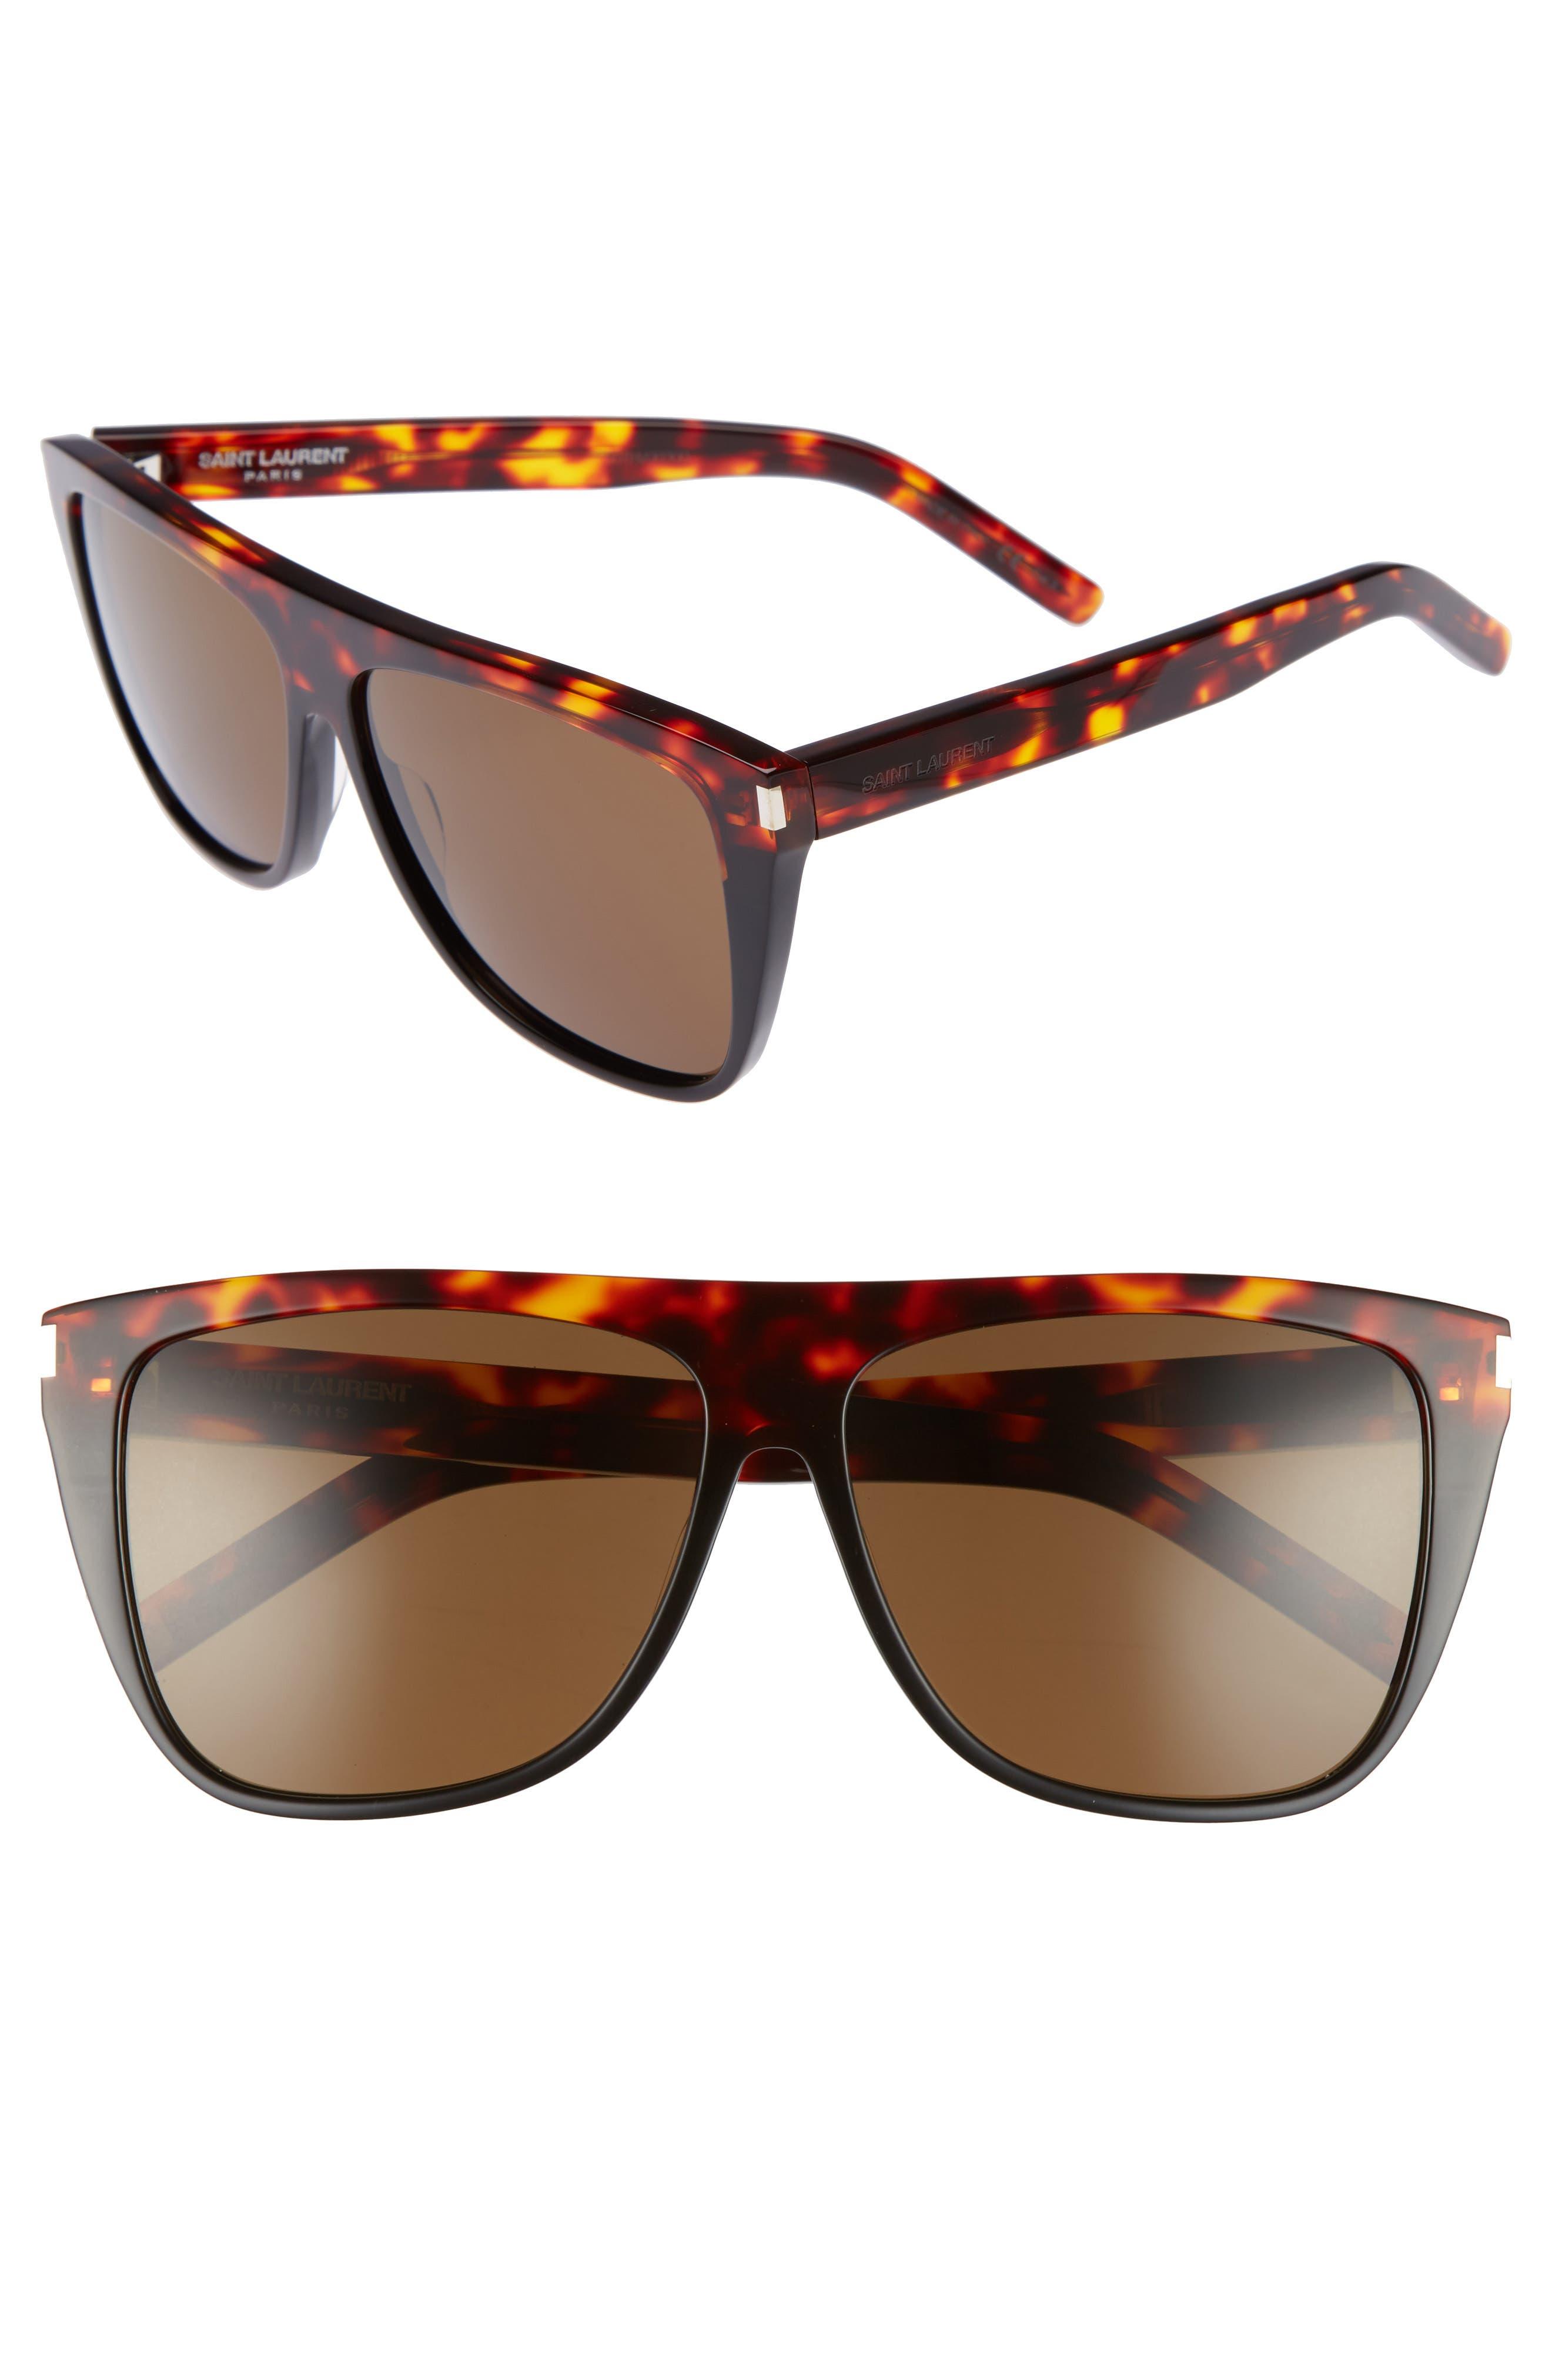 Saint Laurent Sunglasses SL1 59MM FLAT TOP SUNGLASSES - HAVANA